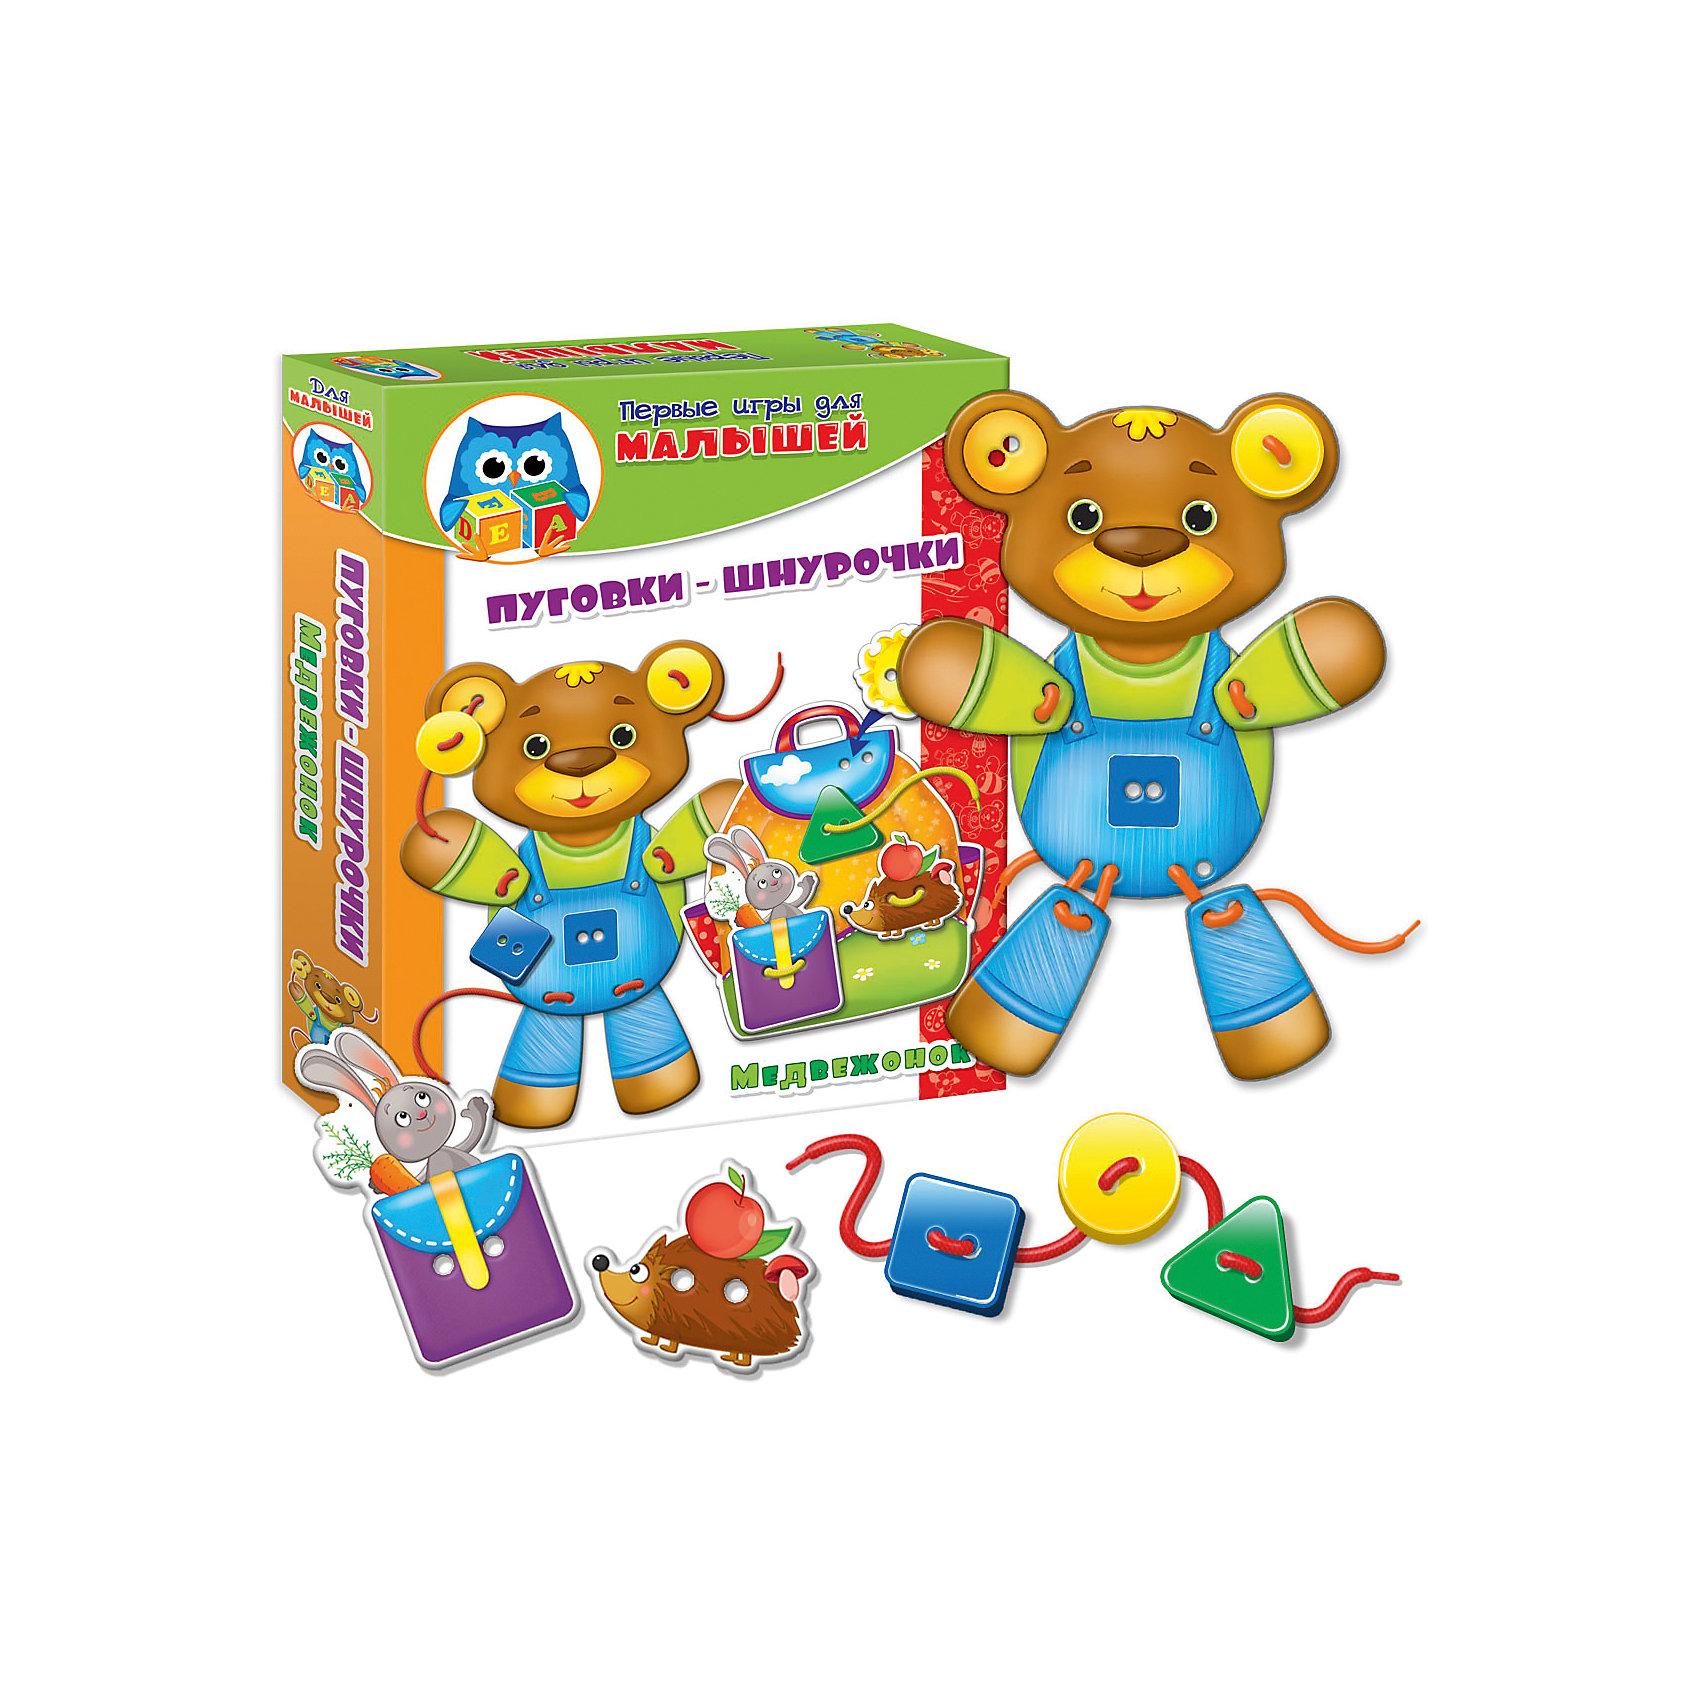 Vladi Toys Набор развивающих игр Медвежонок, Vladi Toys набор для творчества тм vladi раскраски глиттером сова